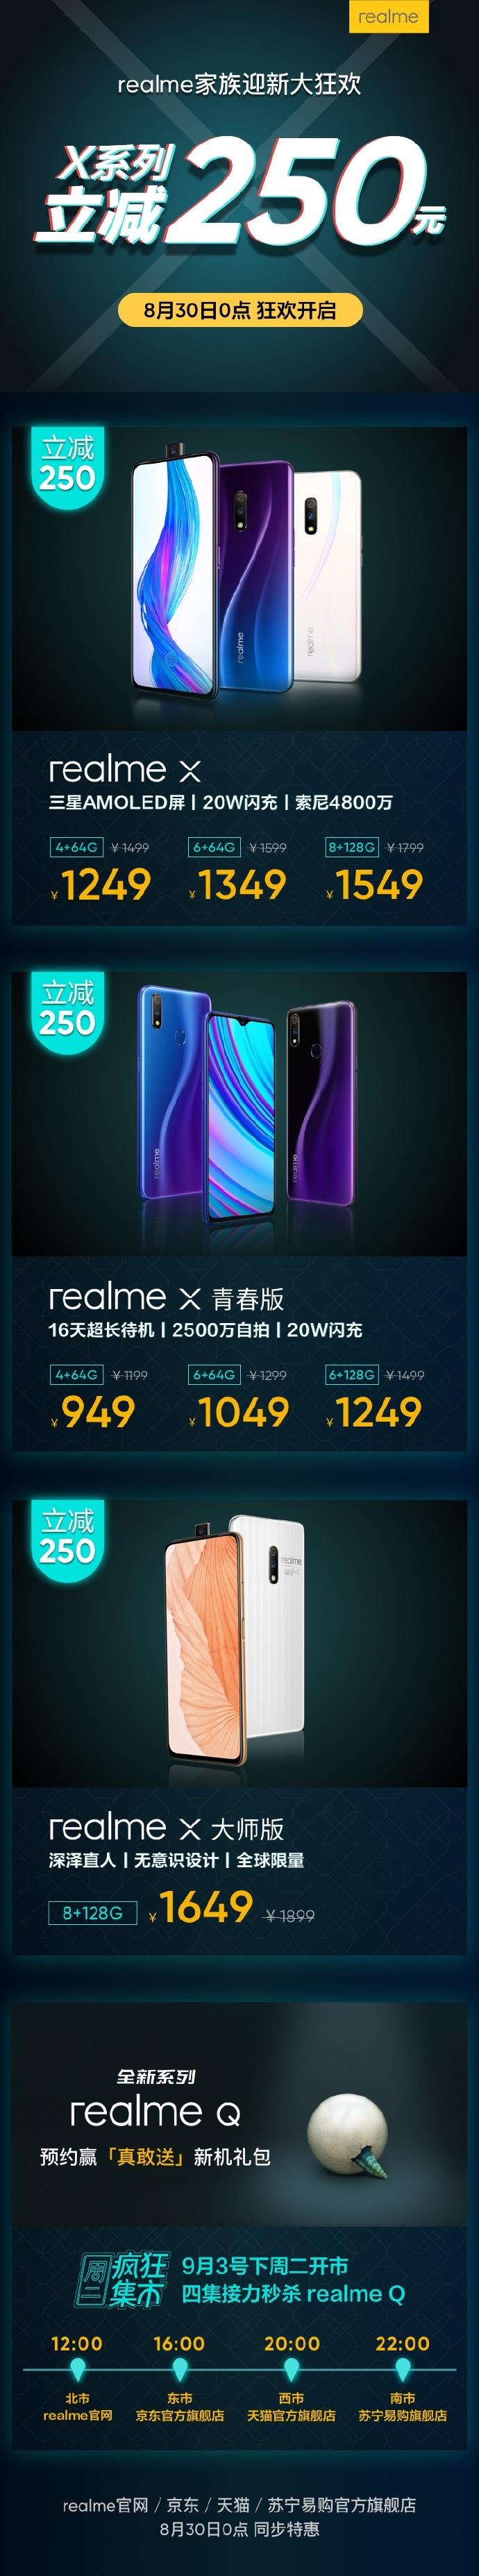 realme X开启狂欢:全系直降250元